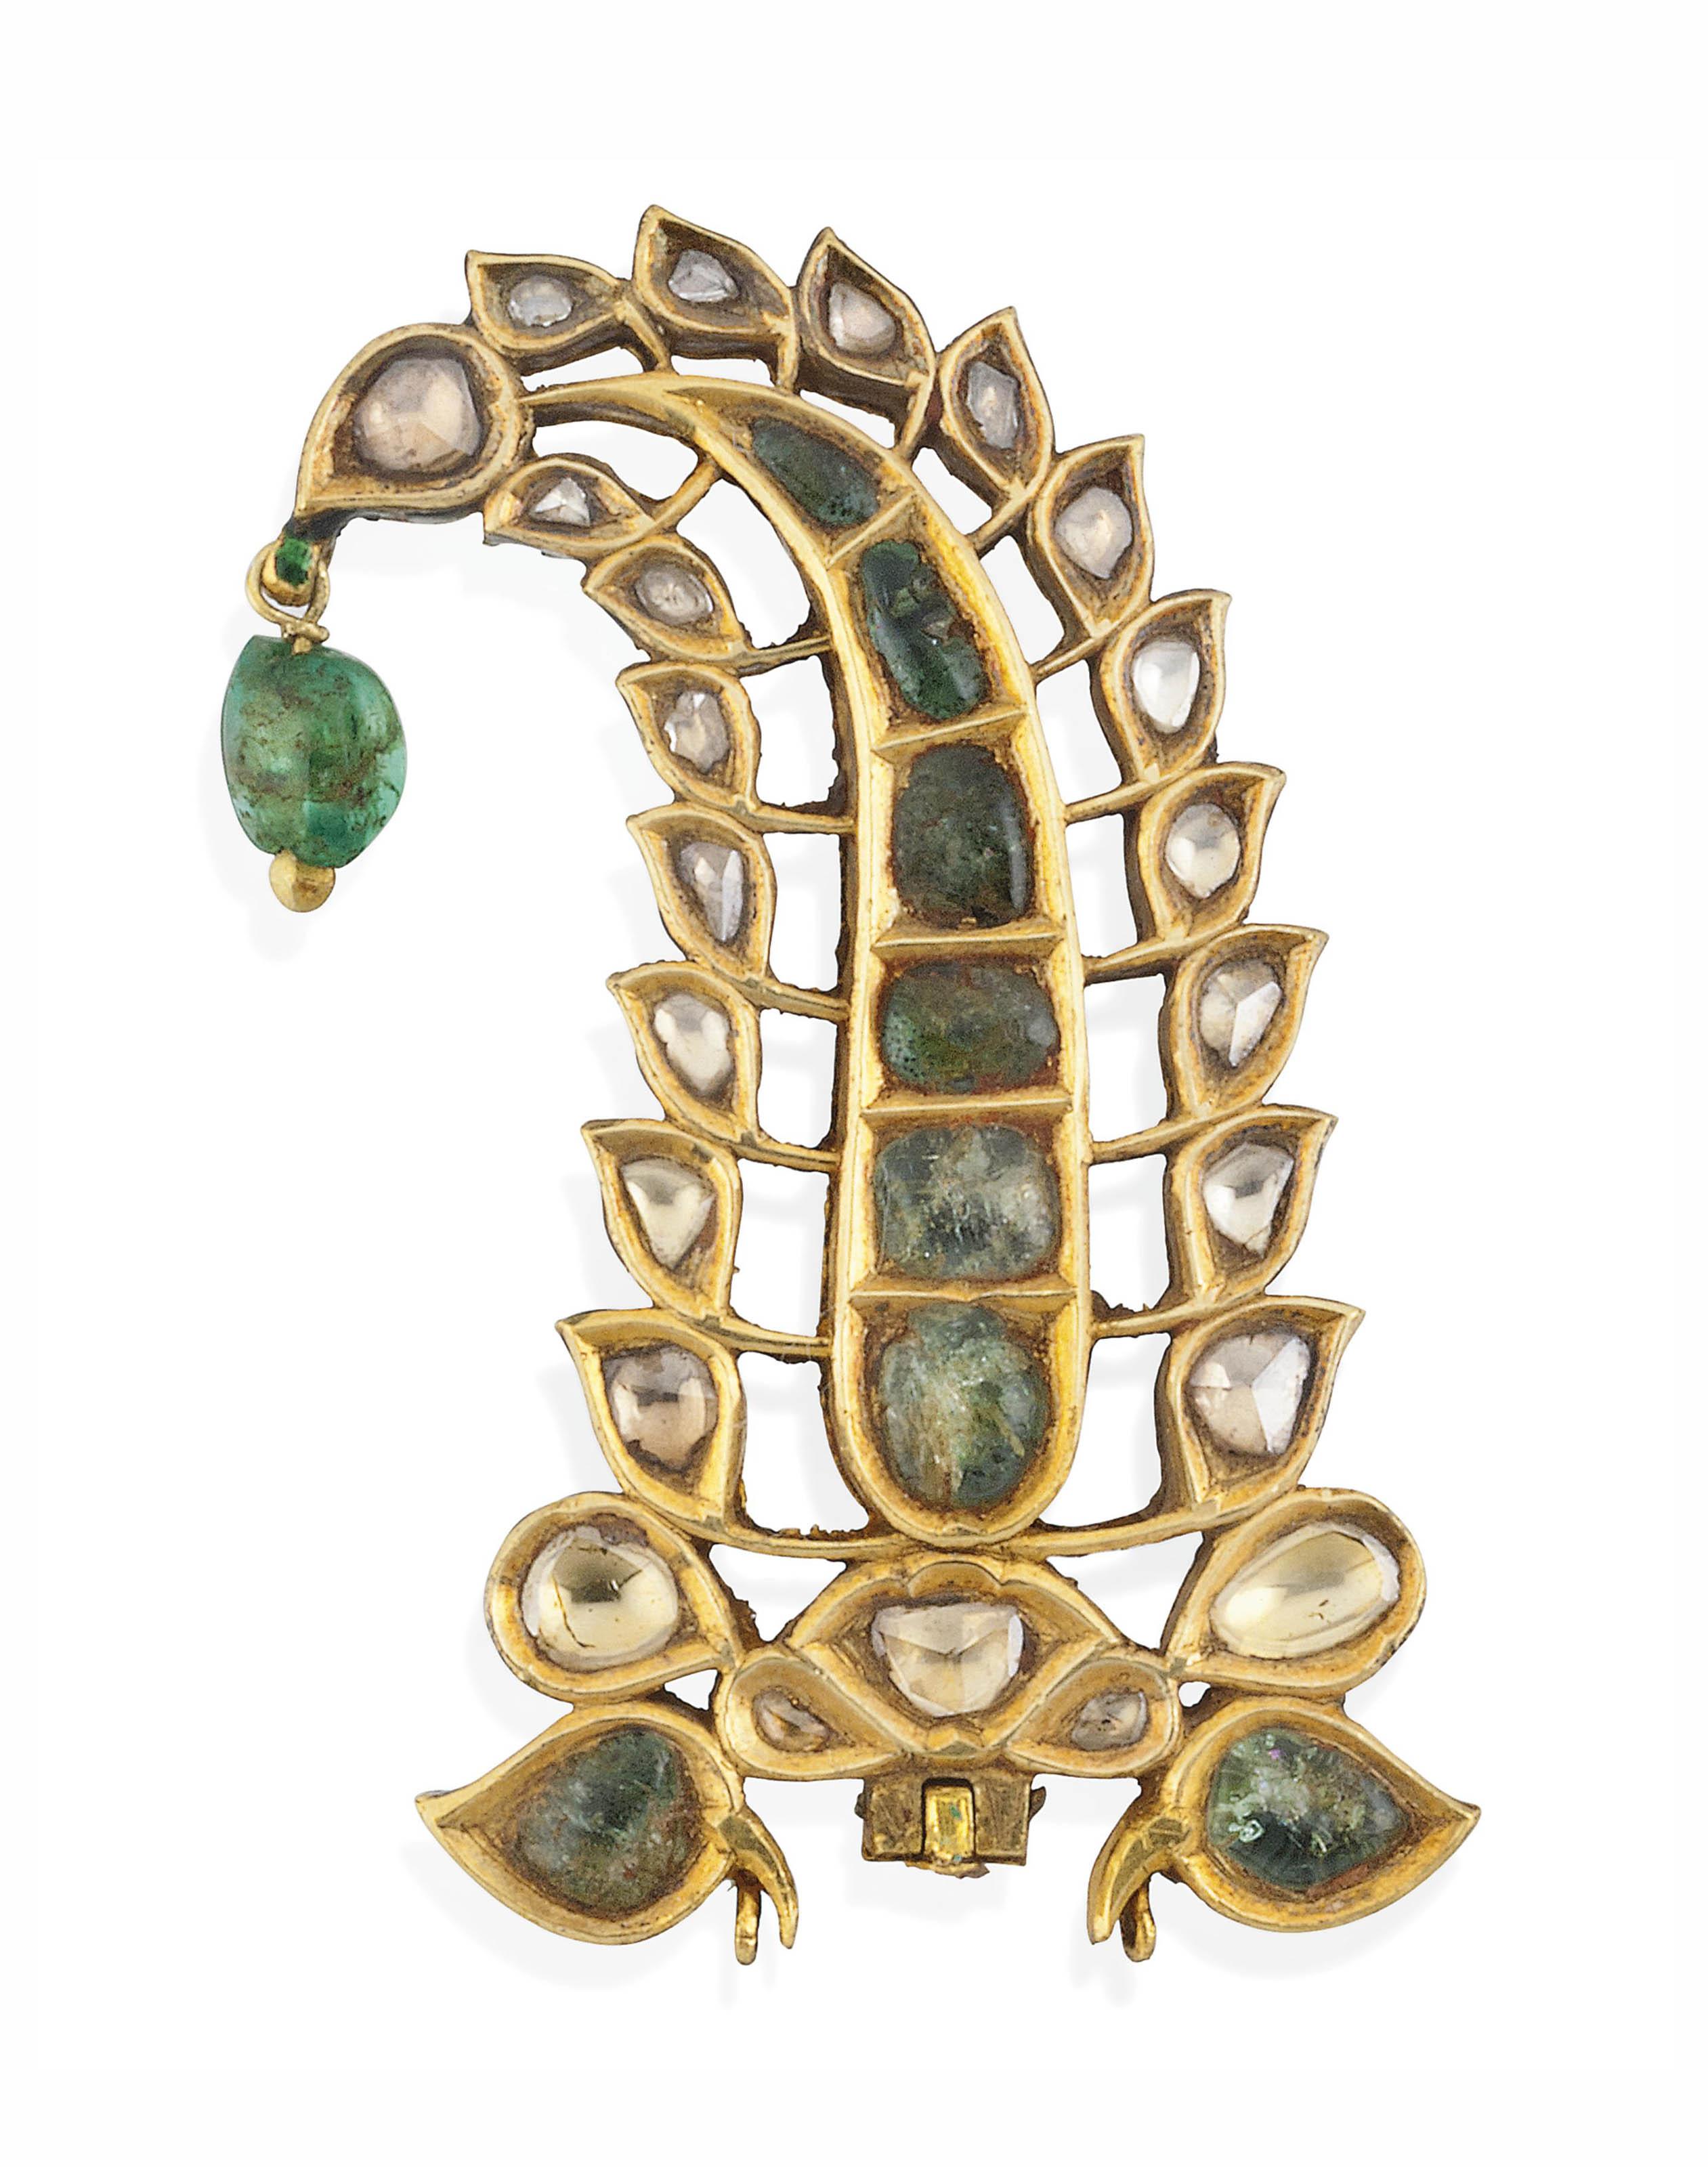 A DIAMOND AND EMERALD-SET GOLD TURBAN ORNAMENT (SARPECH)